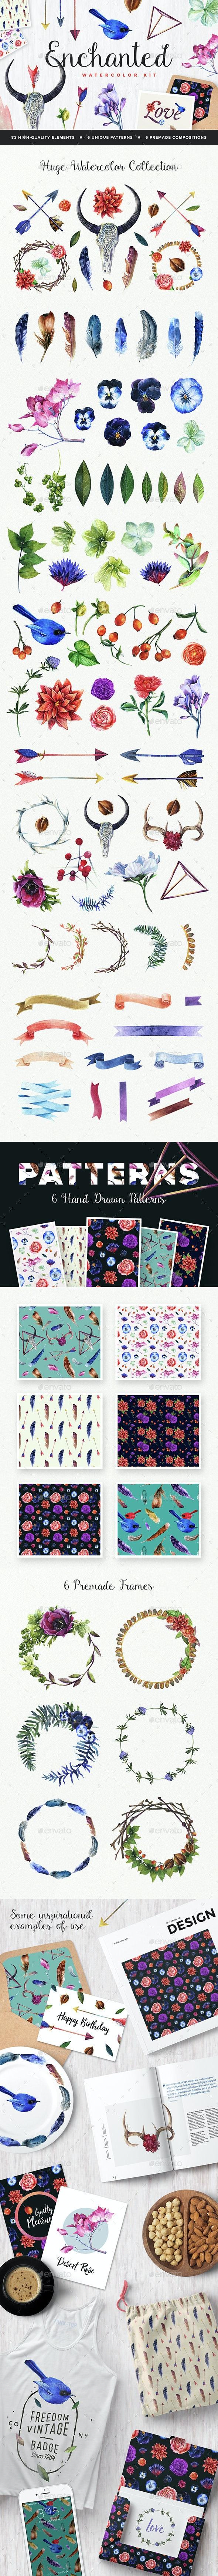 Enchanted Watercolor Kit - Decorative Graphics